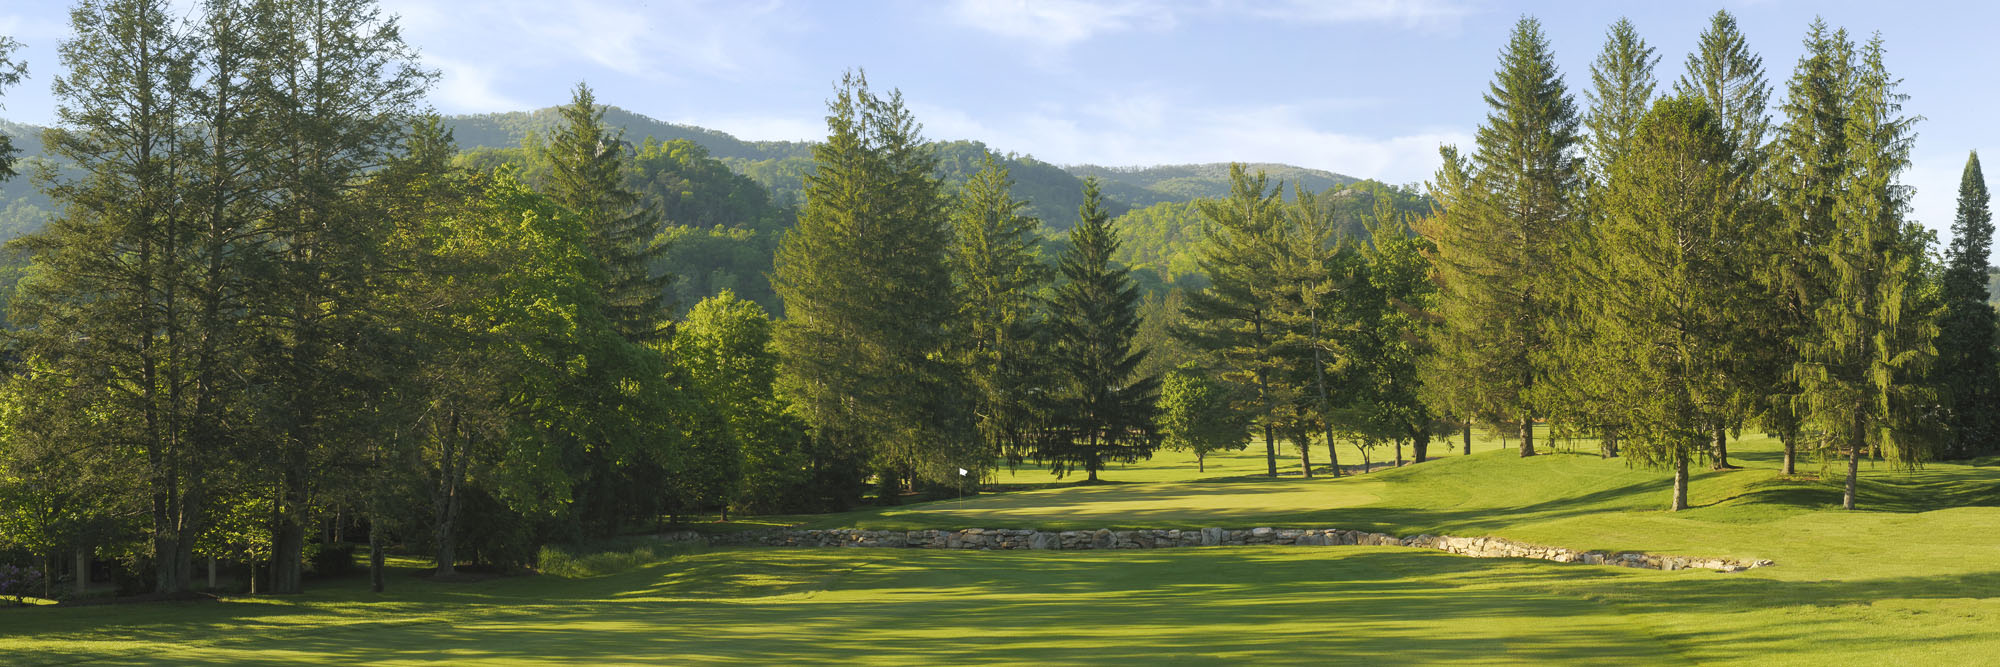 Golf Course Image - The Greenbrier Meadows Course No. 14